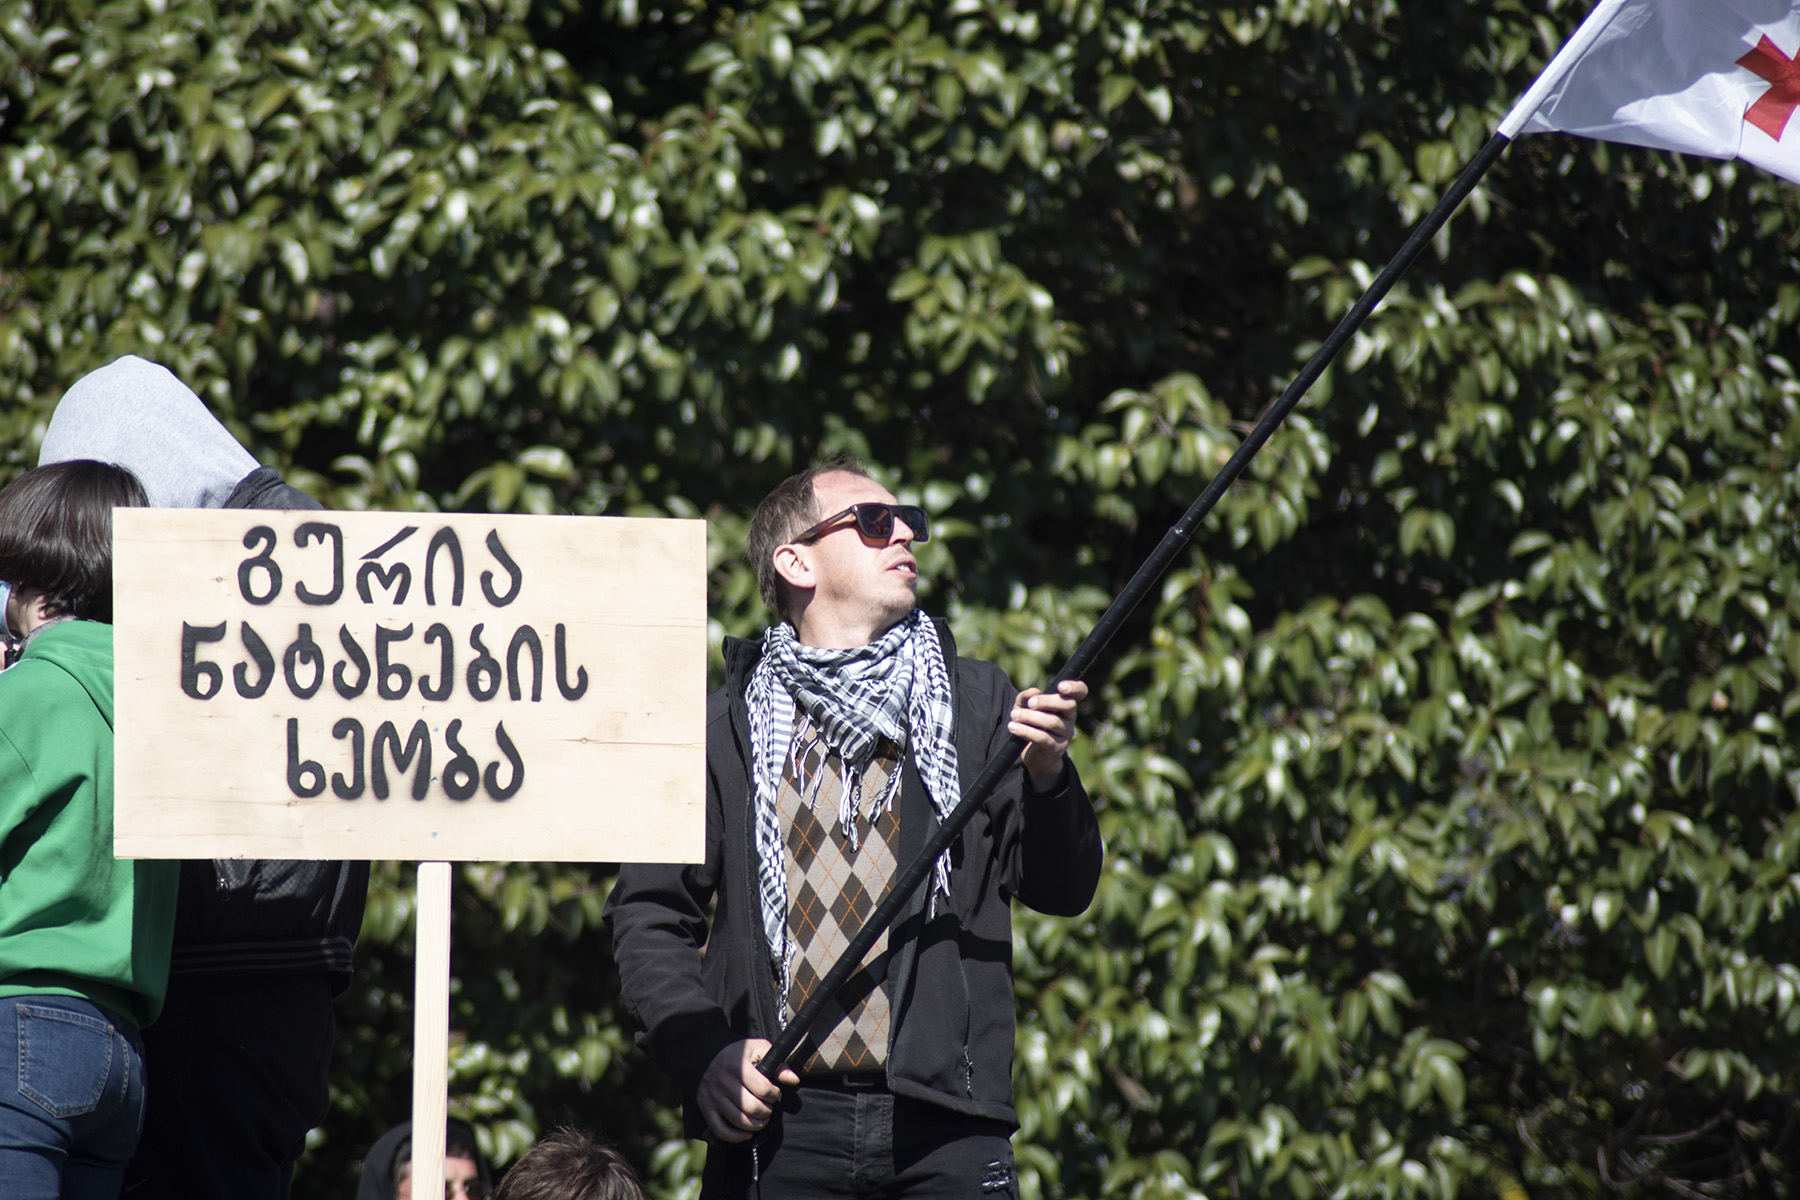 Плакат: «Гуриа, Натанебская долина». Фото: Мариам Никурадзе / OC Media